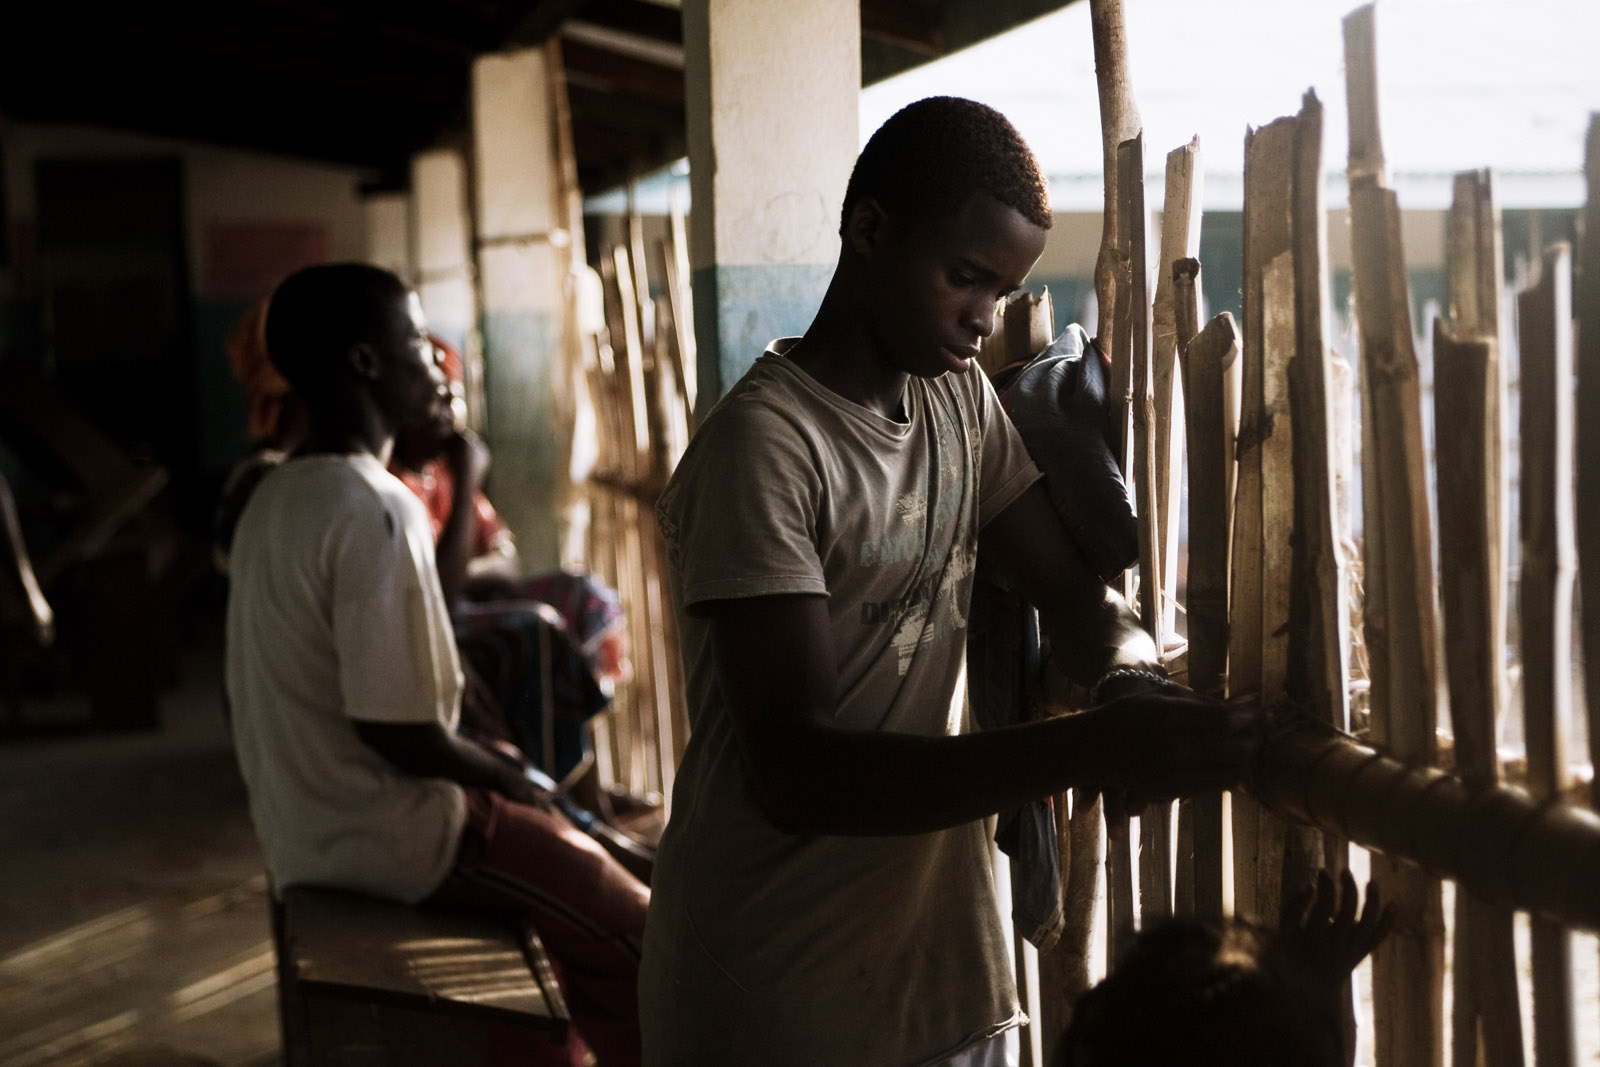 liberia-refugies-ivoiriens-0311-9859hd